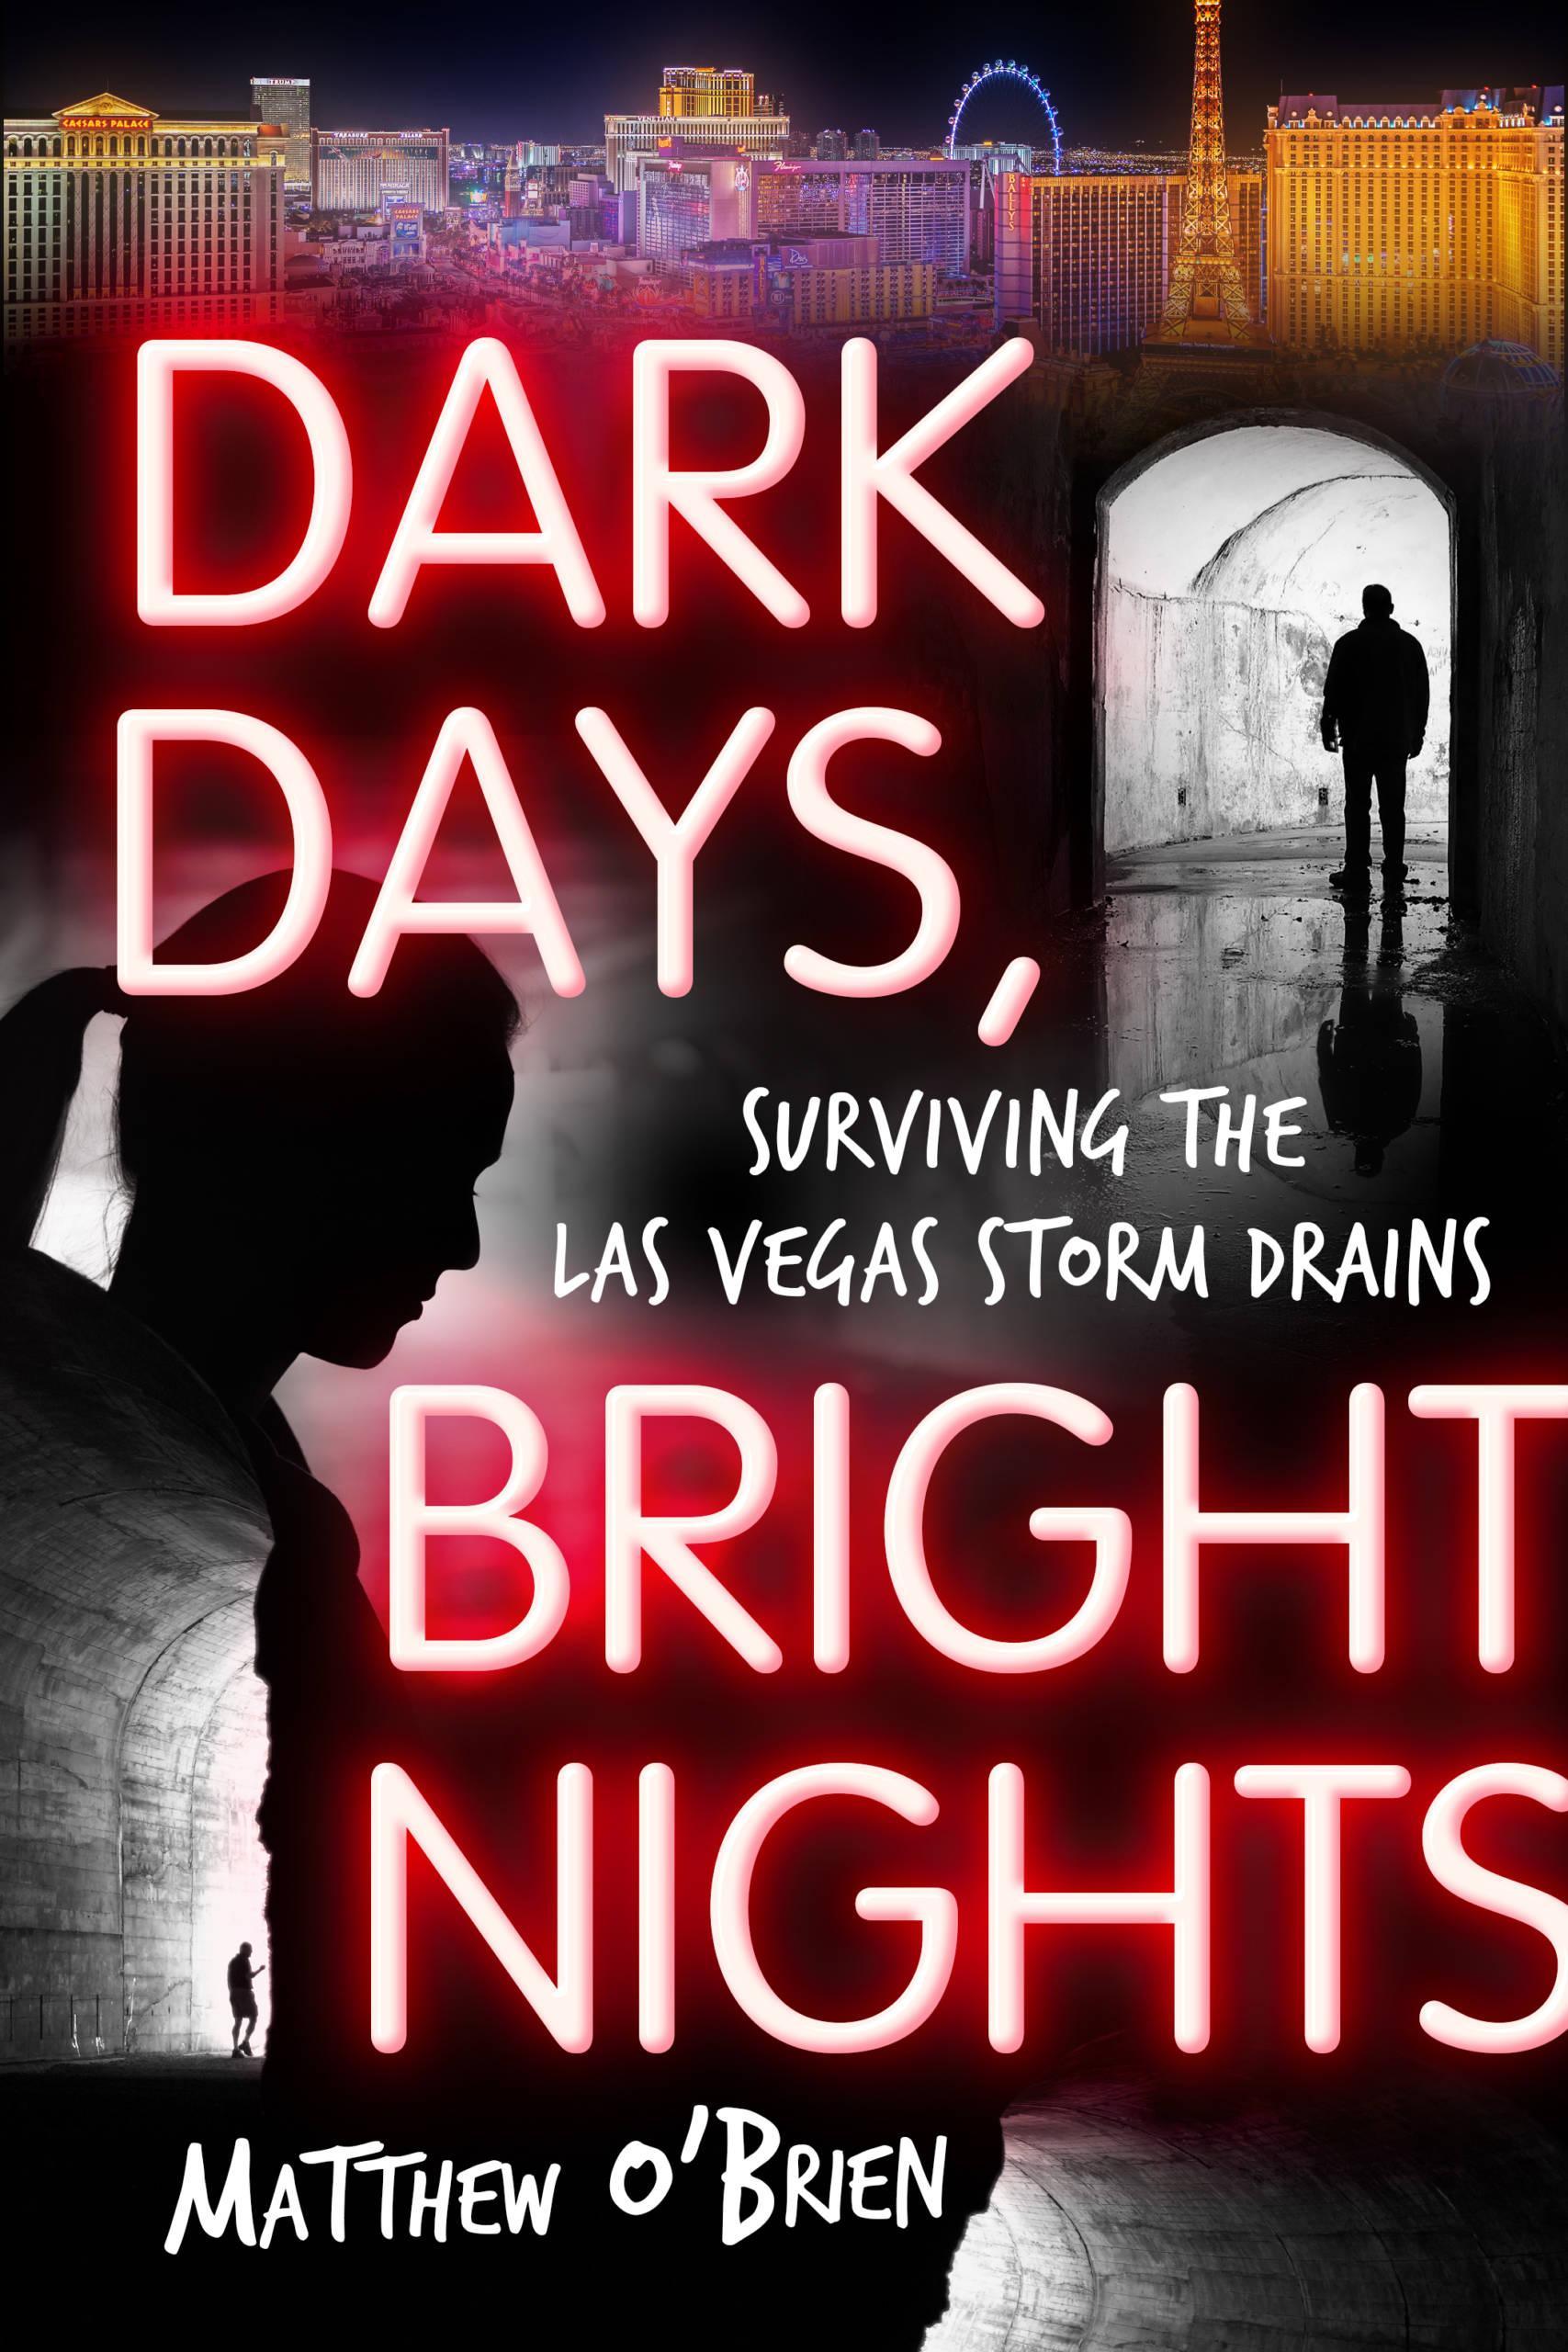 Dark Days, Bright Nights: Surviving the Las Vegas Storm Drains